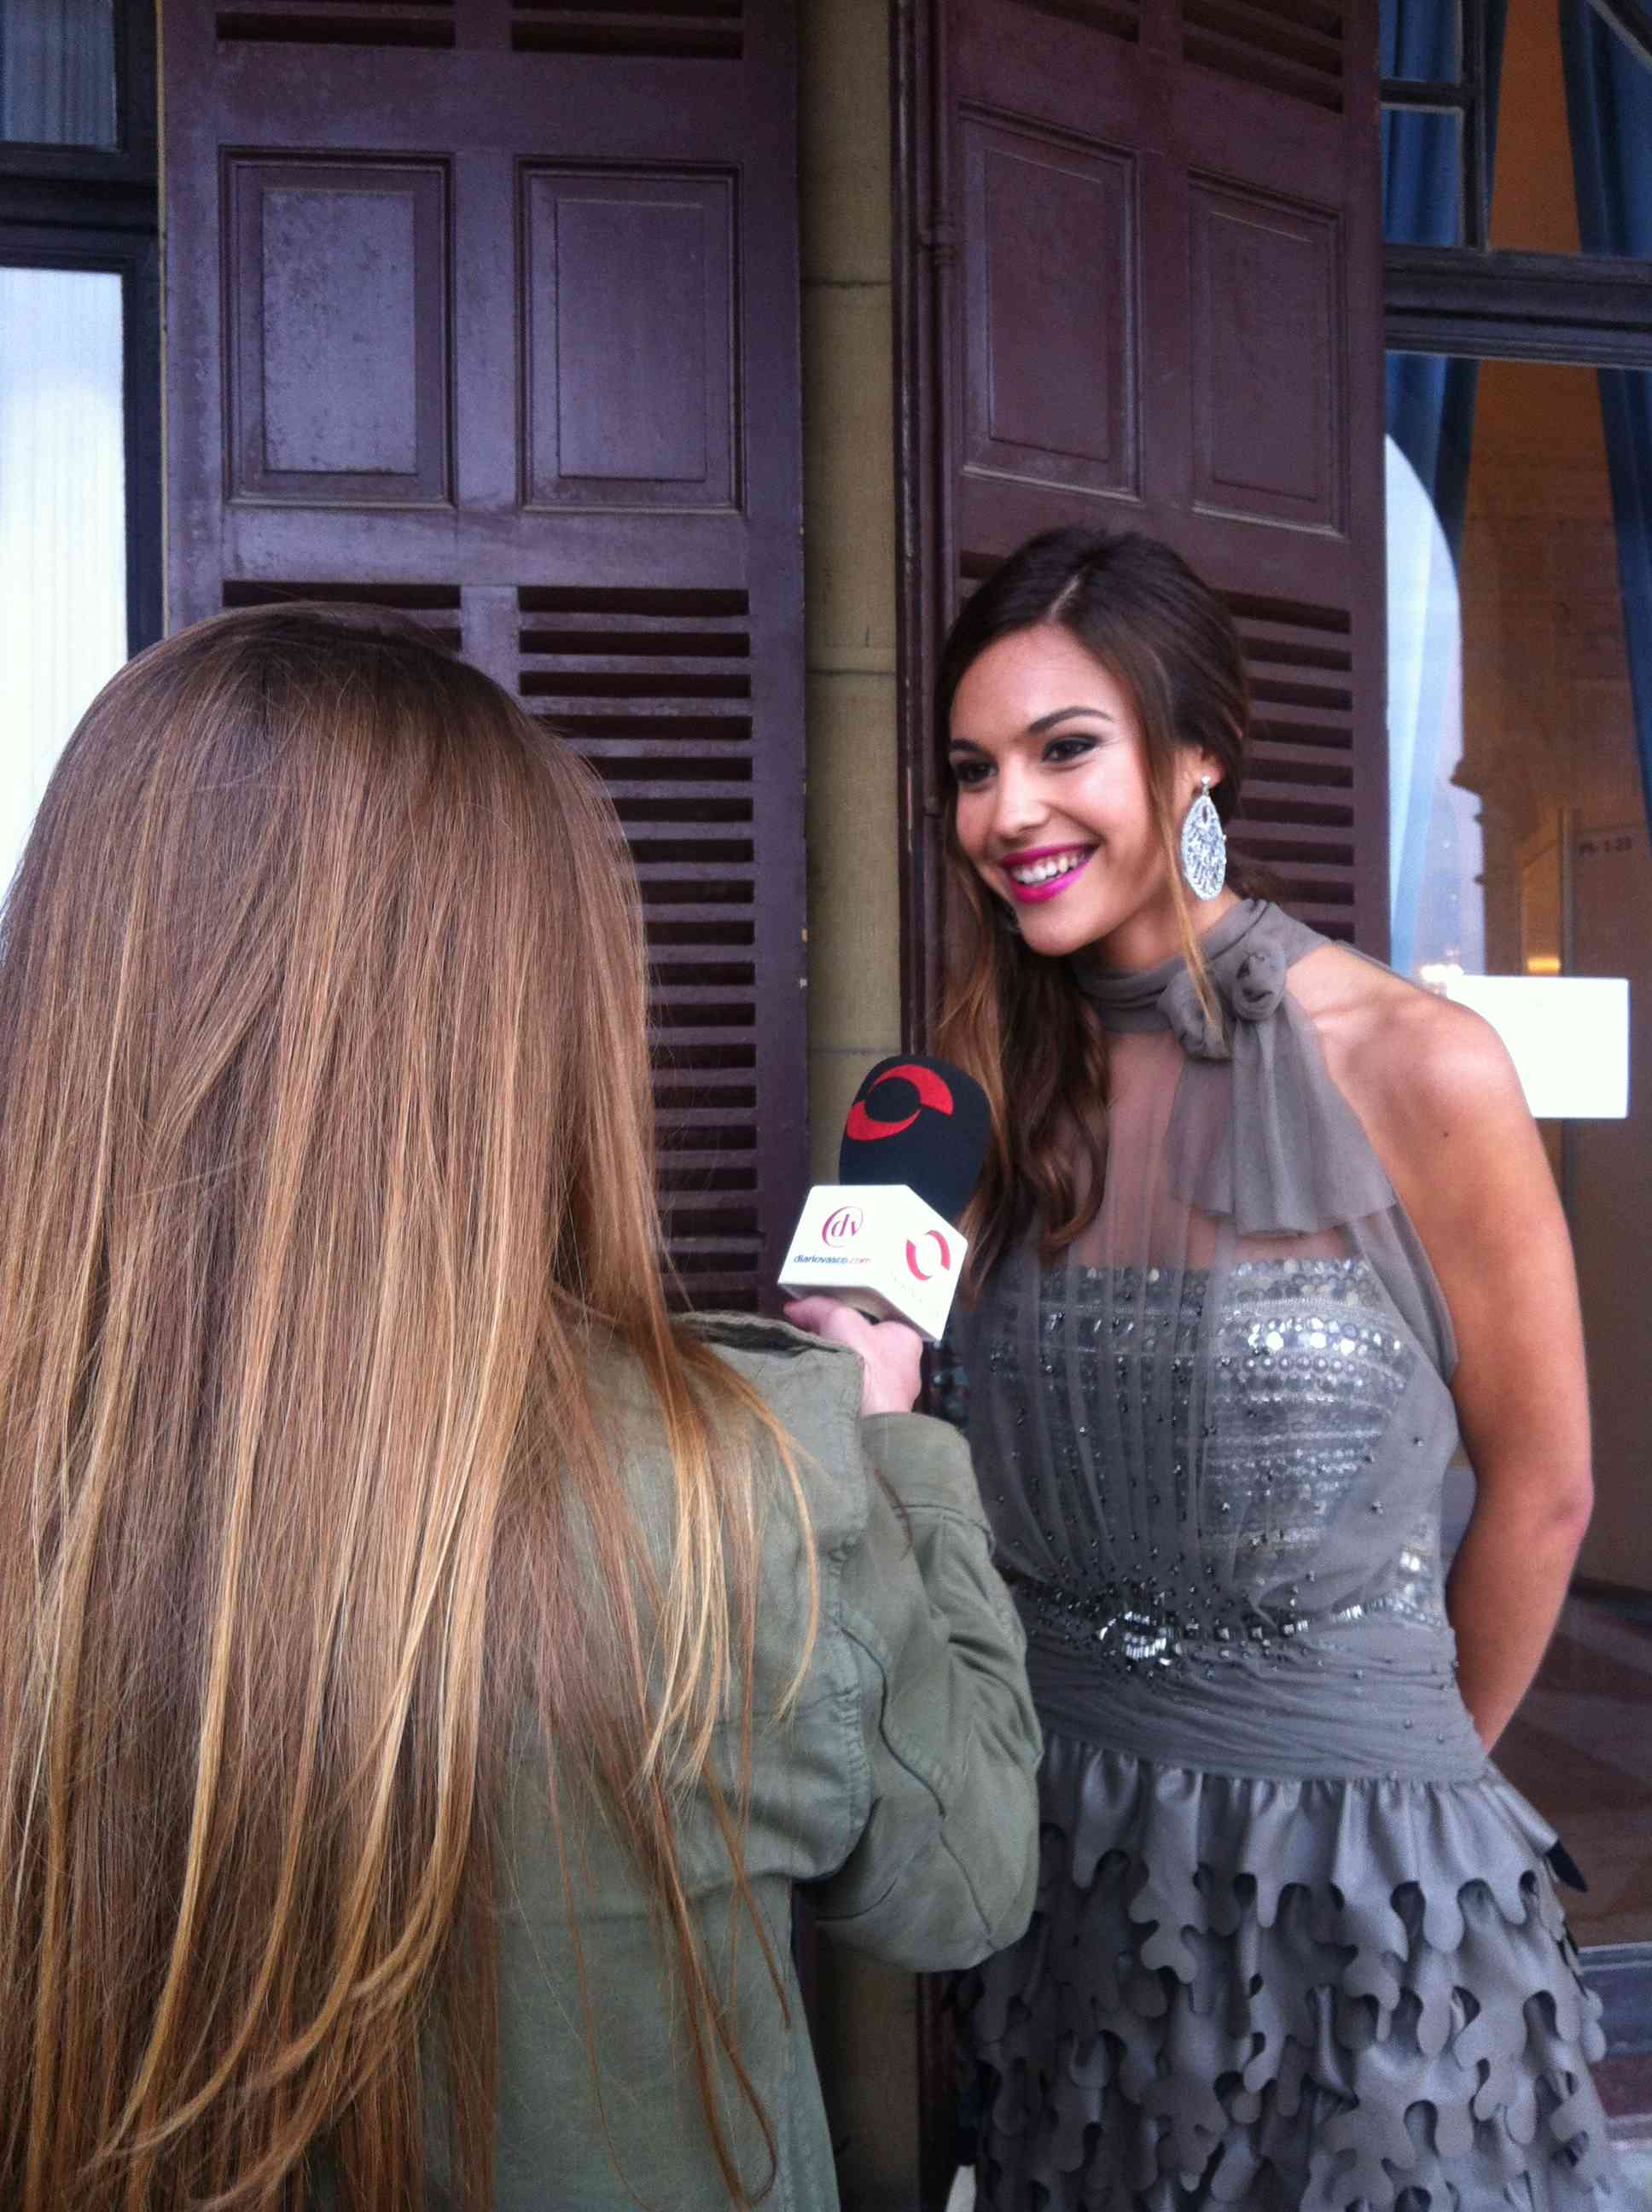 elena ibarbia, miss espana mundo 2013. - Página 2 Img_4512